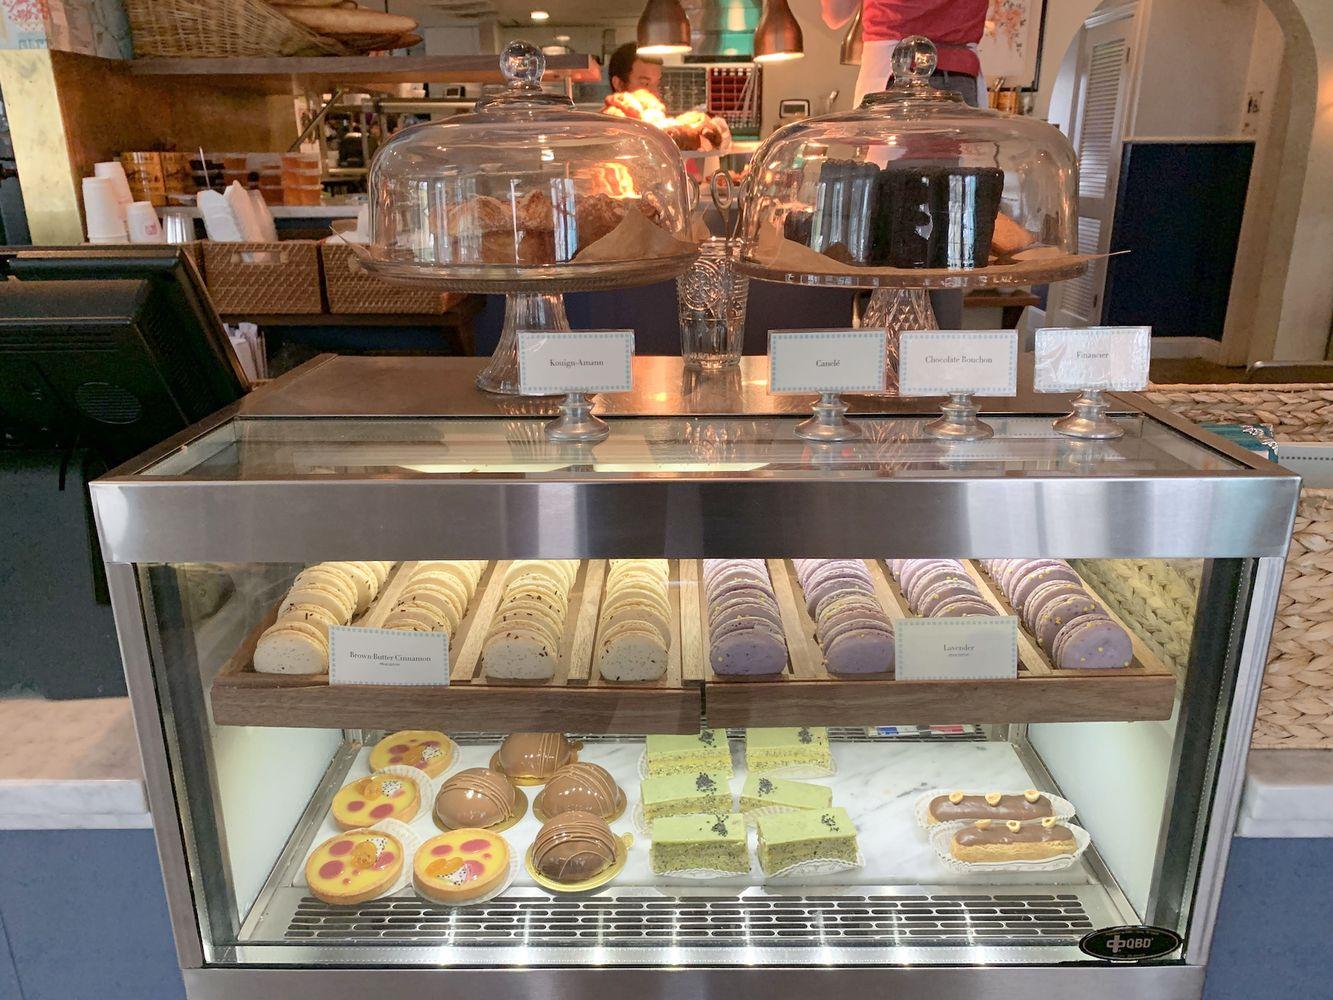 Pastries at Elizabeth Street Cafe, Austin